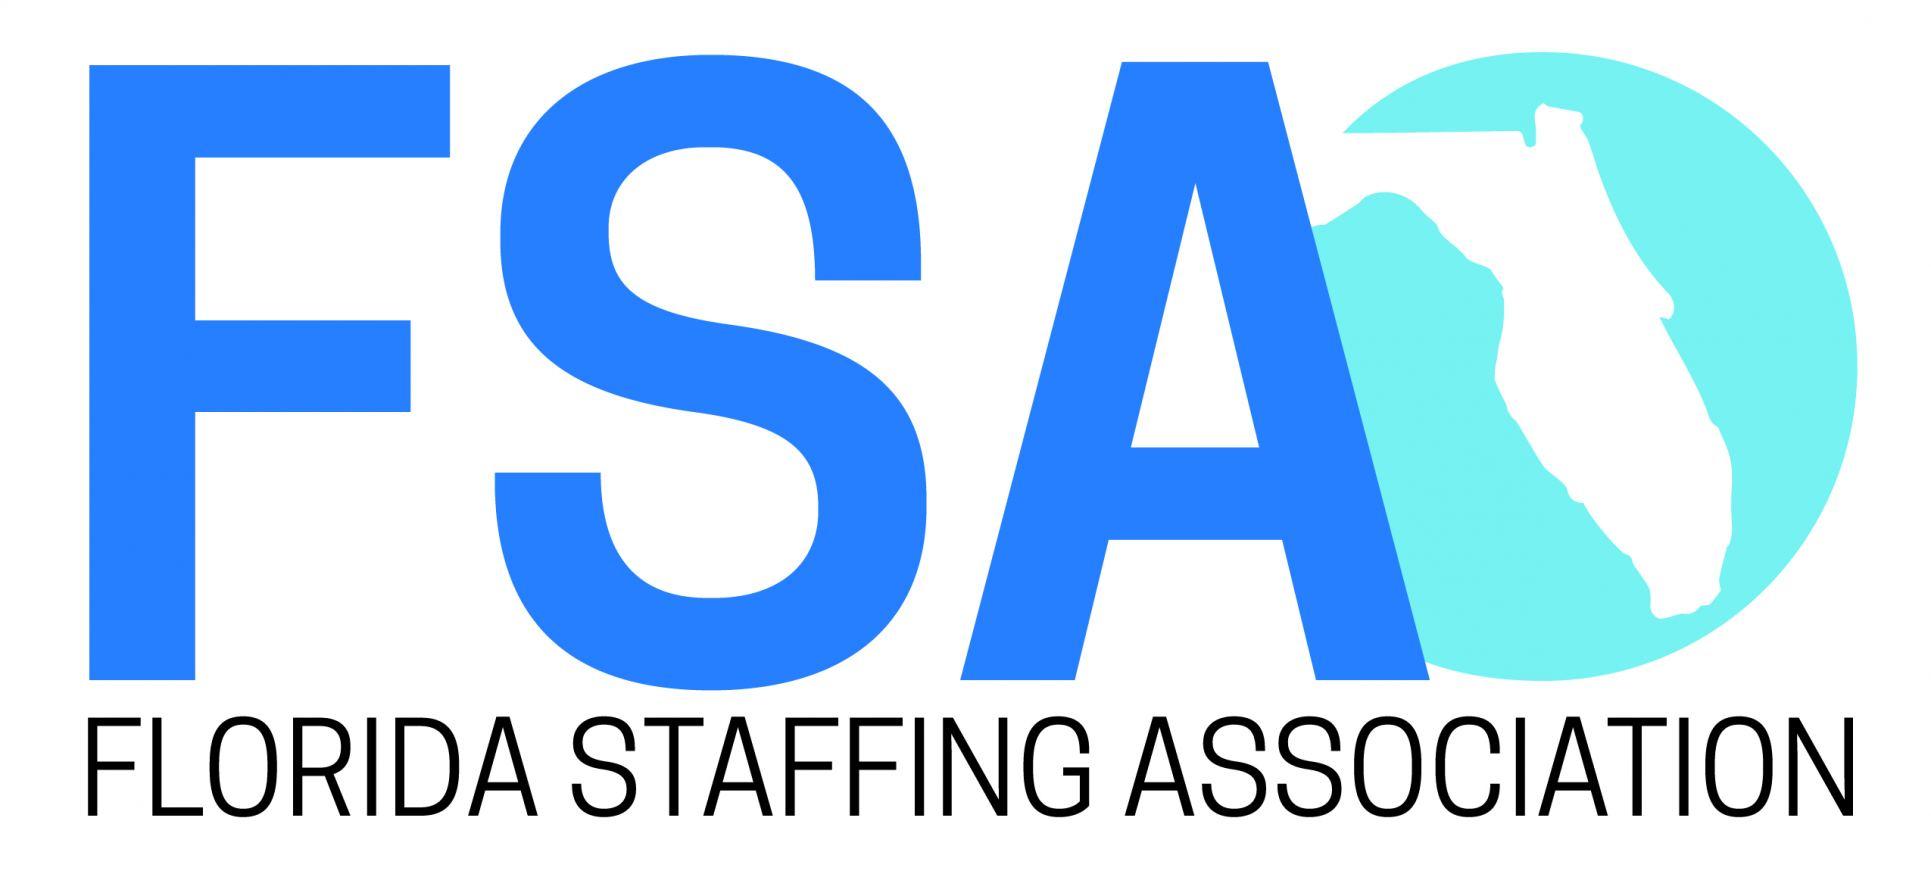 Florida Staffing Association Logo